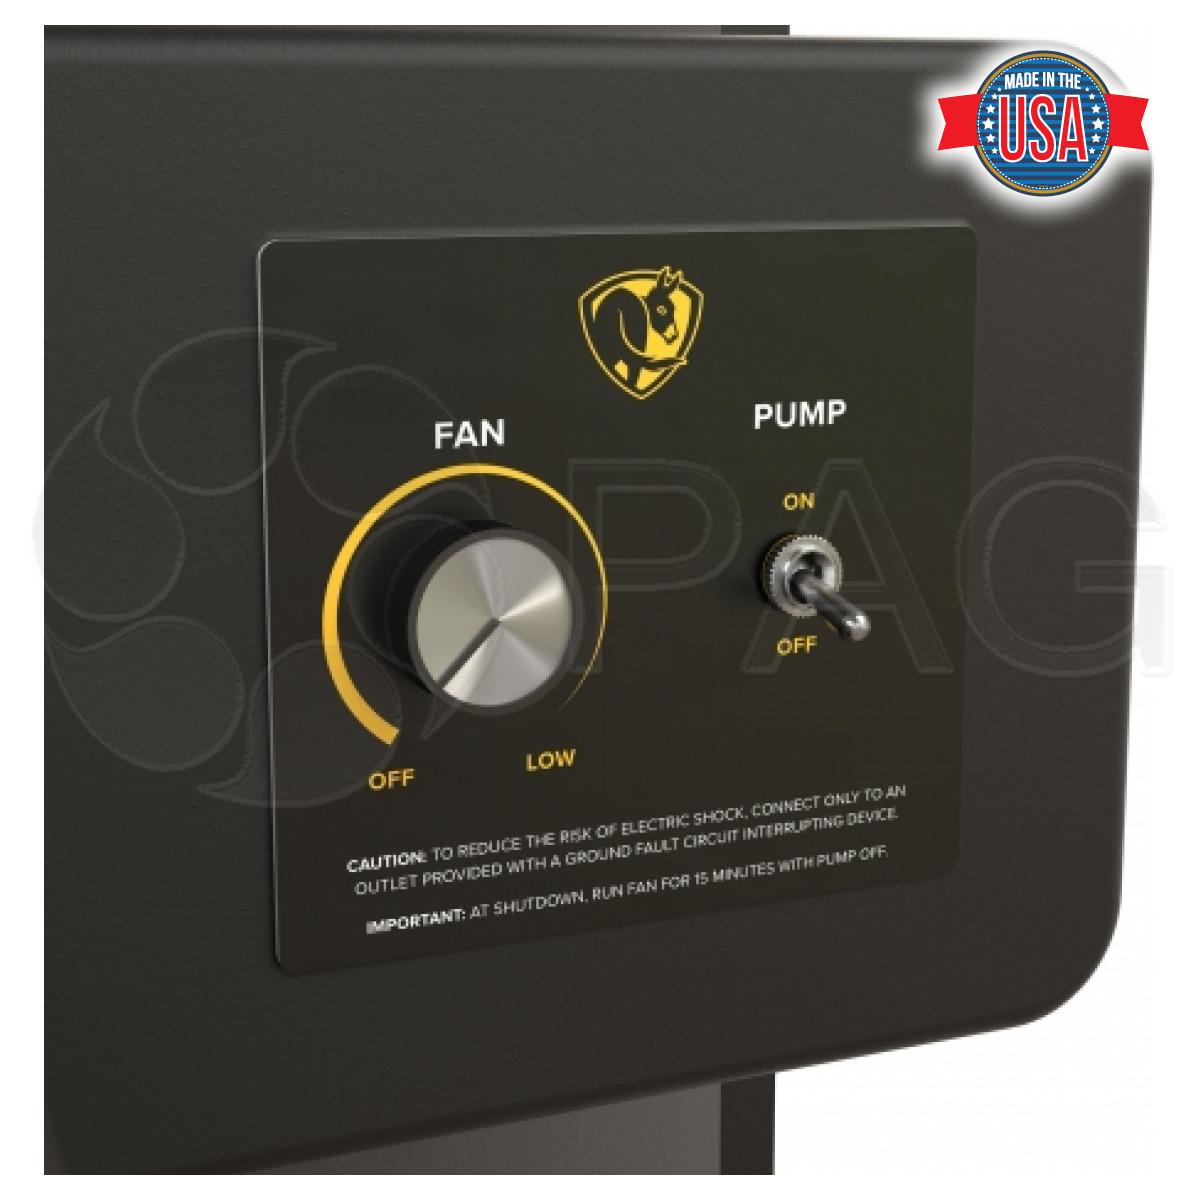 Big Ass Fans Cold Front 400 Evaporative Cooler Control Panel